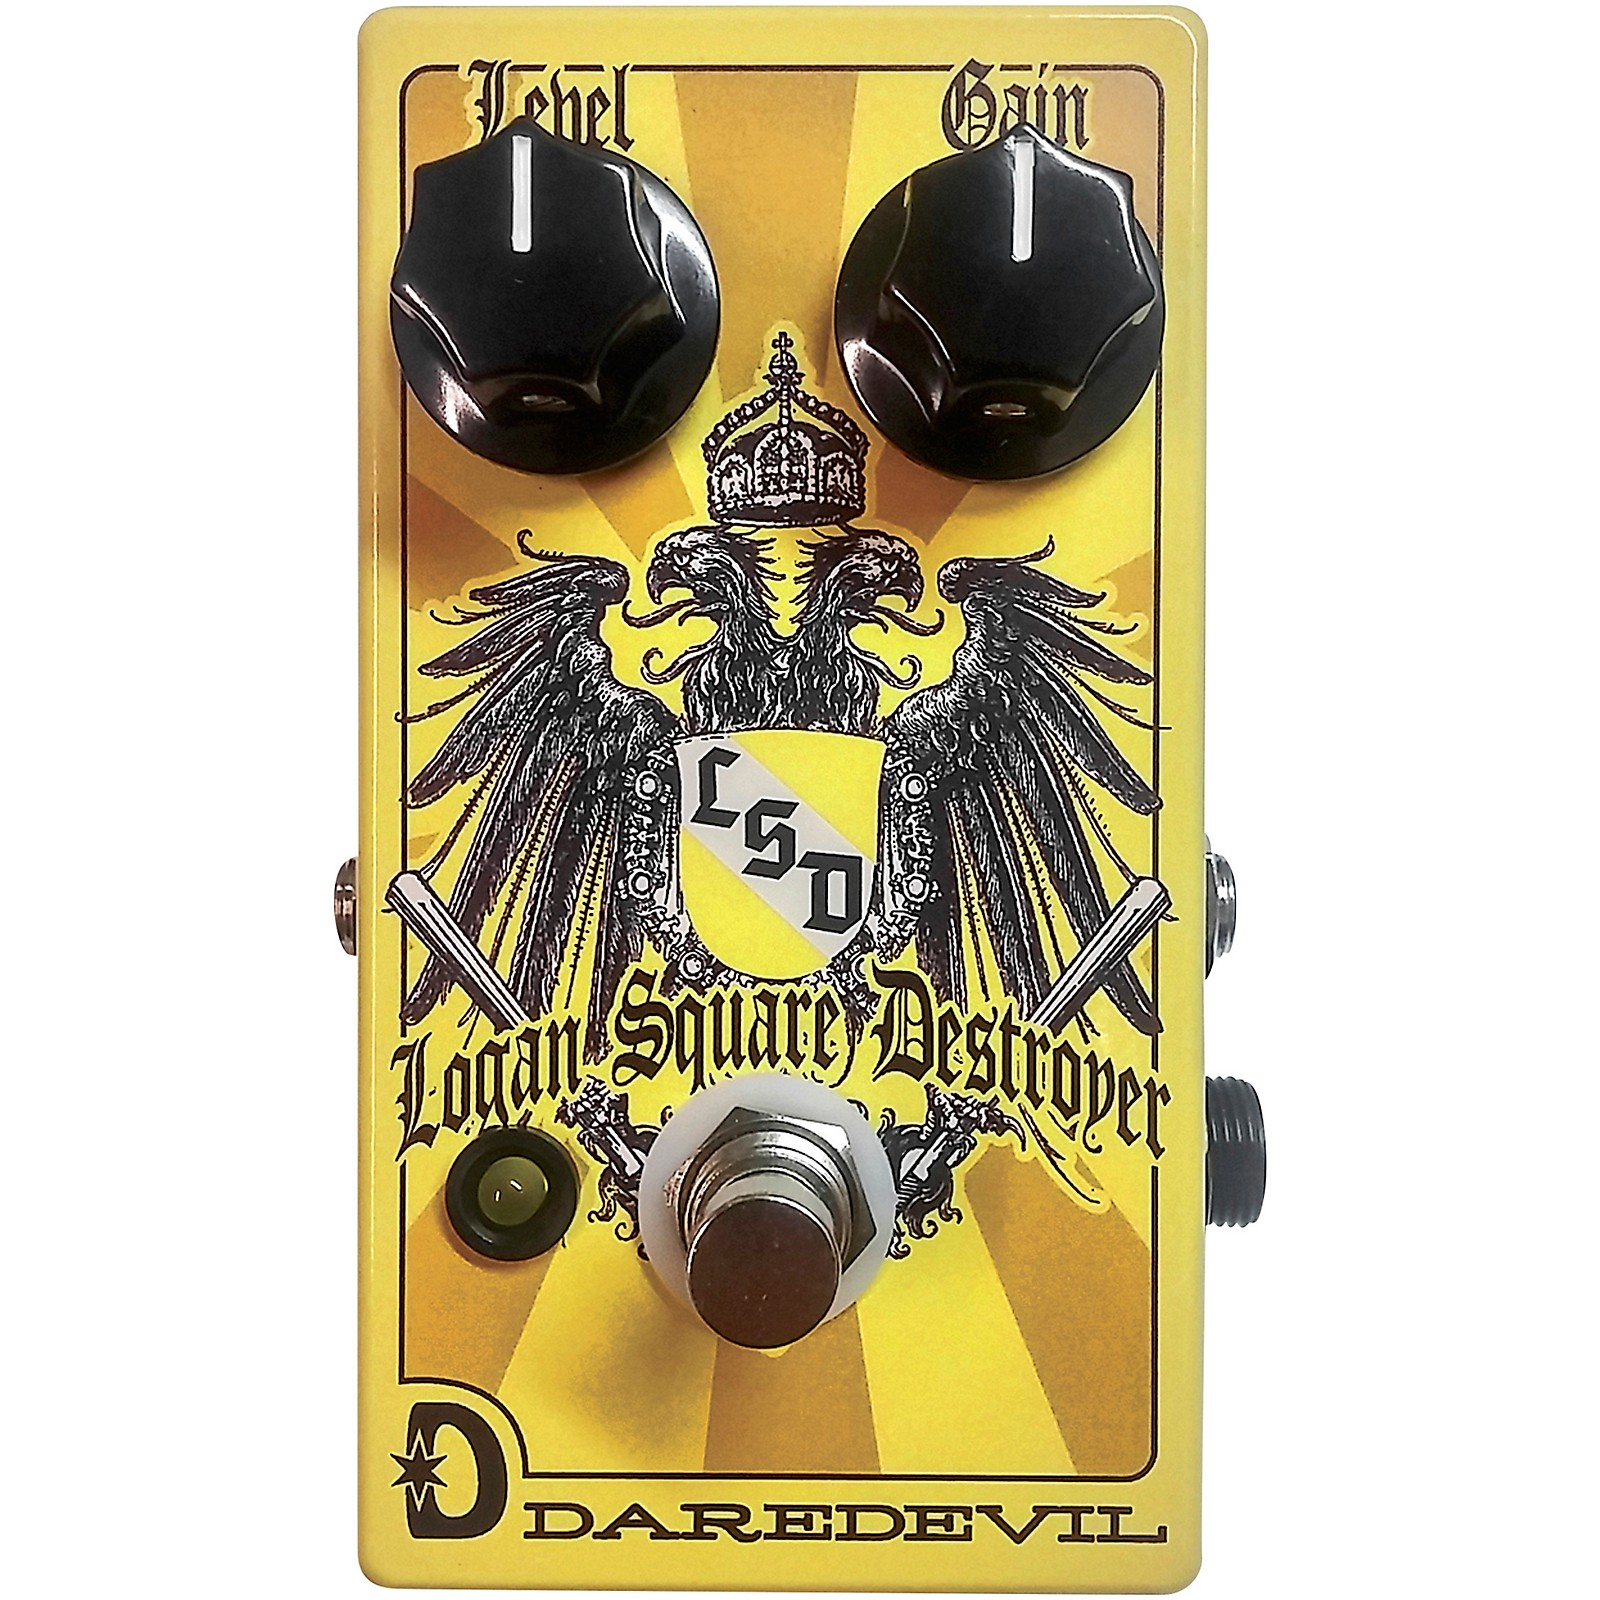 Daredevil Pedals LSD Logan Square Destroyer Fuzz V2 Effects Pedal